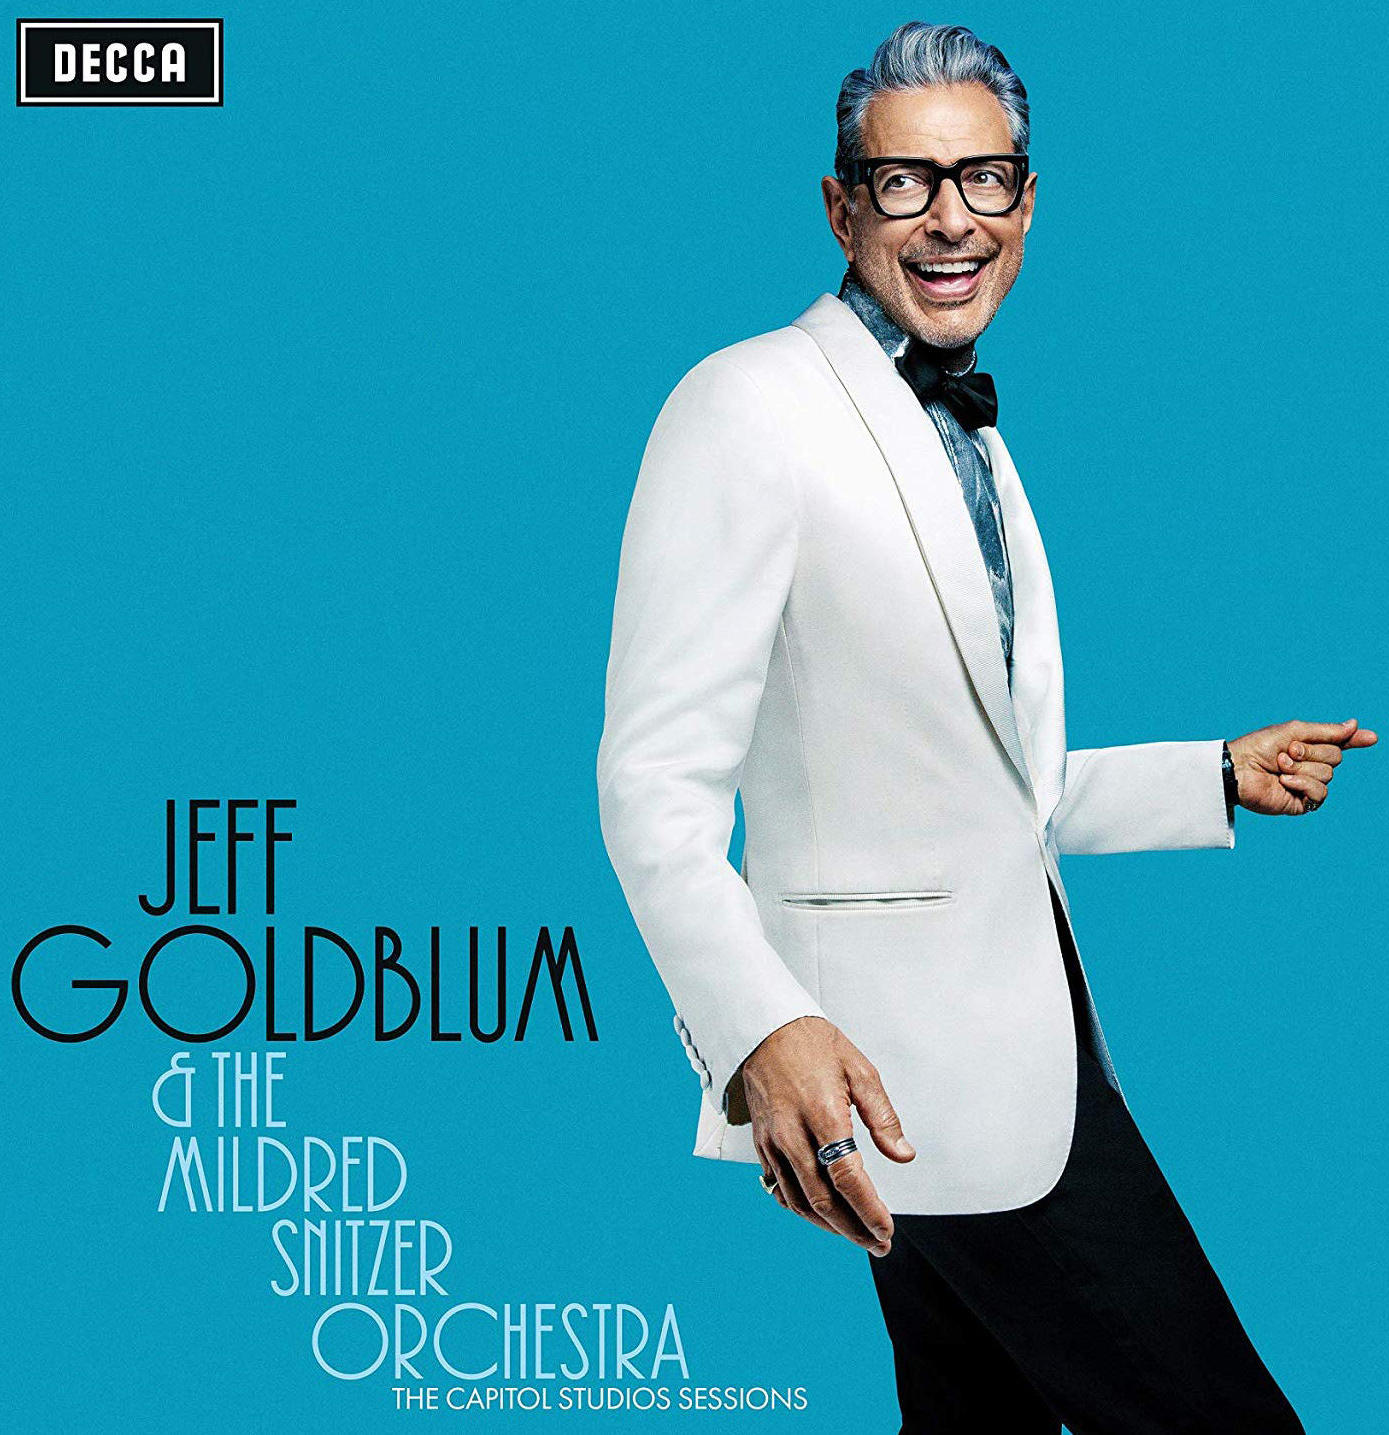 JeffGoldblumSnitzer 20 Things You Never Knew About Jeff Goldblum